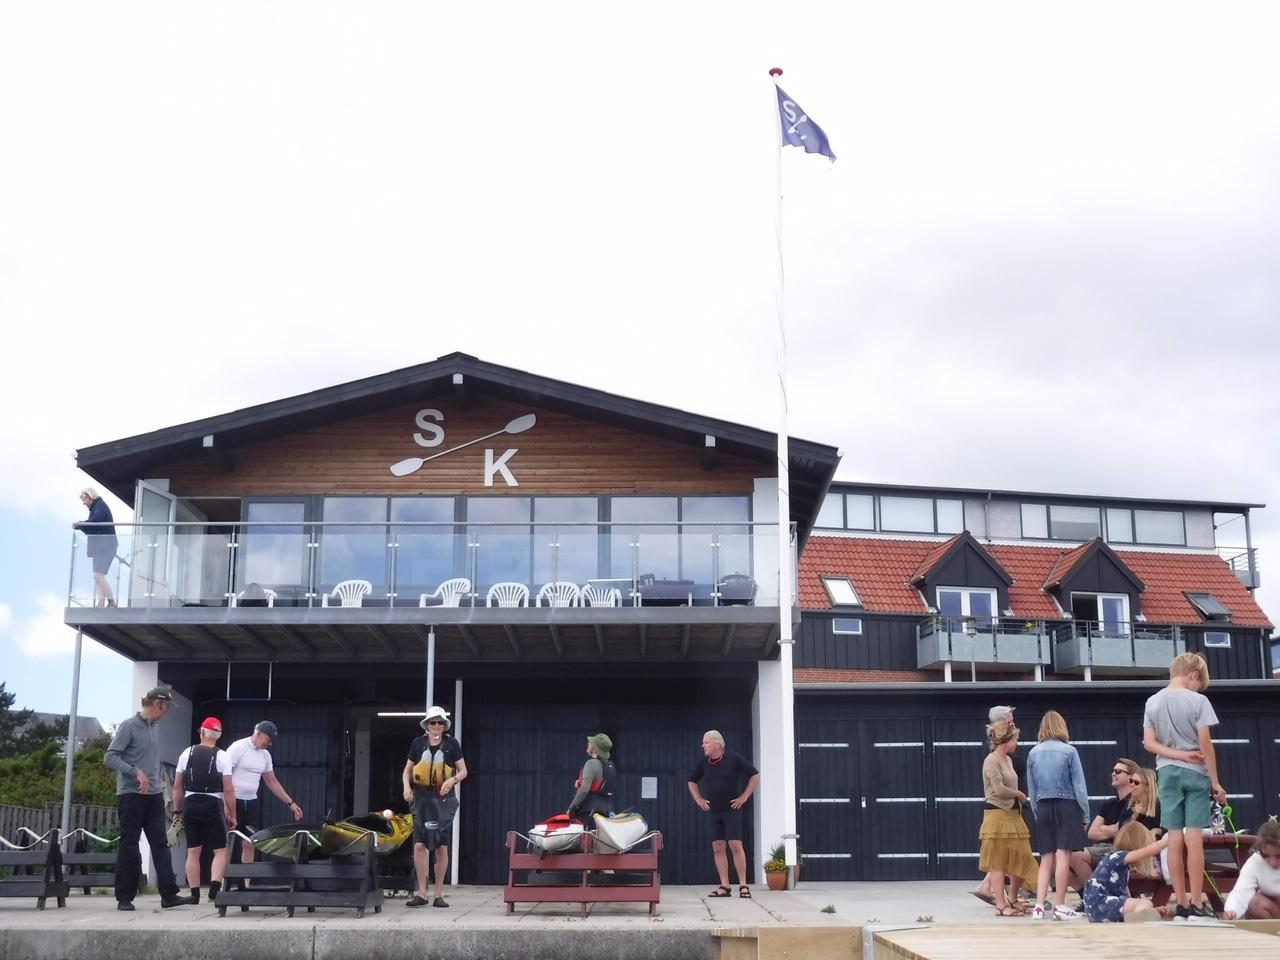 Besøøg-i-Svendborg-Kajakklub-9